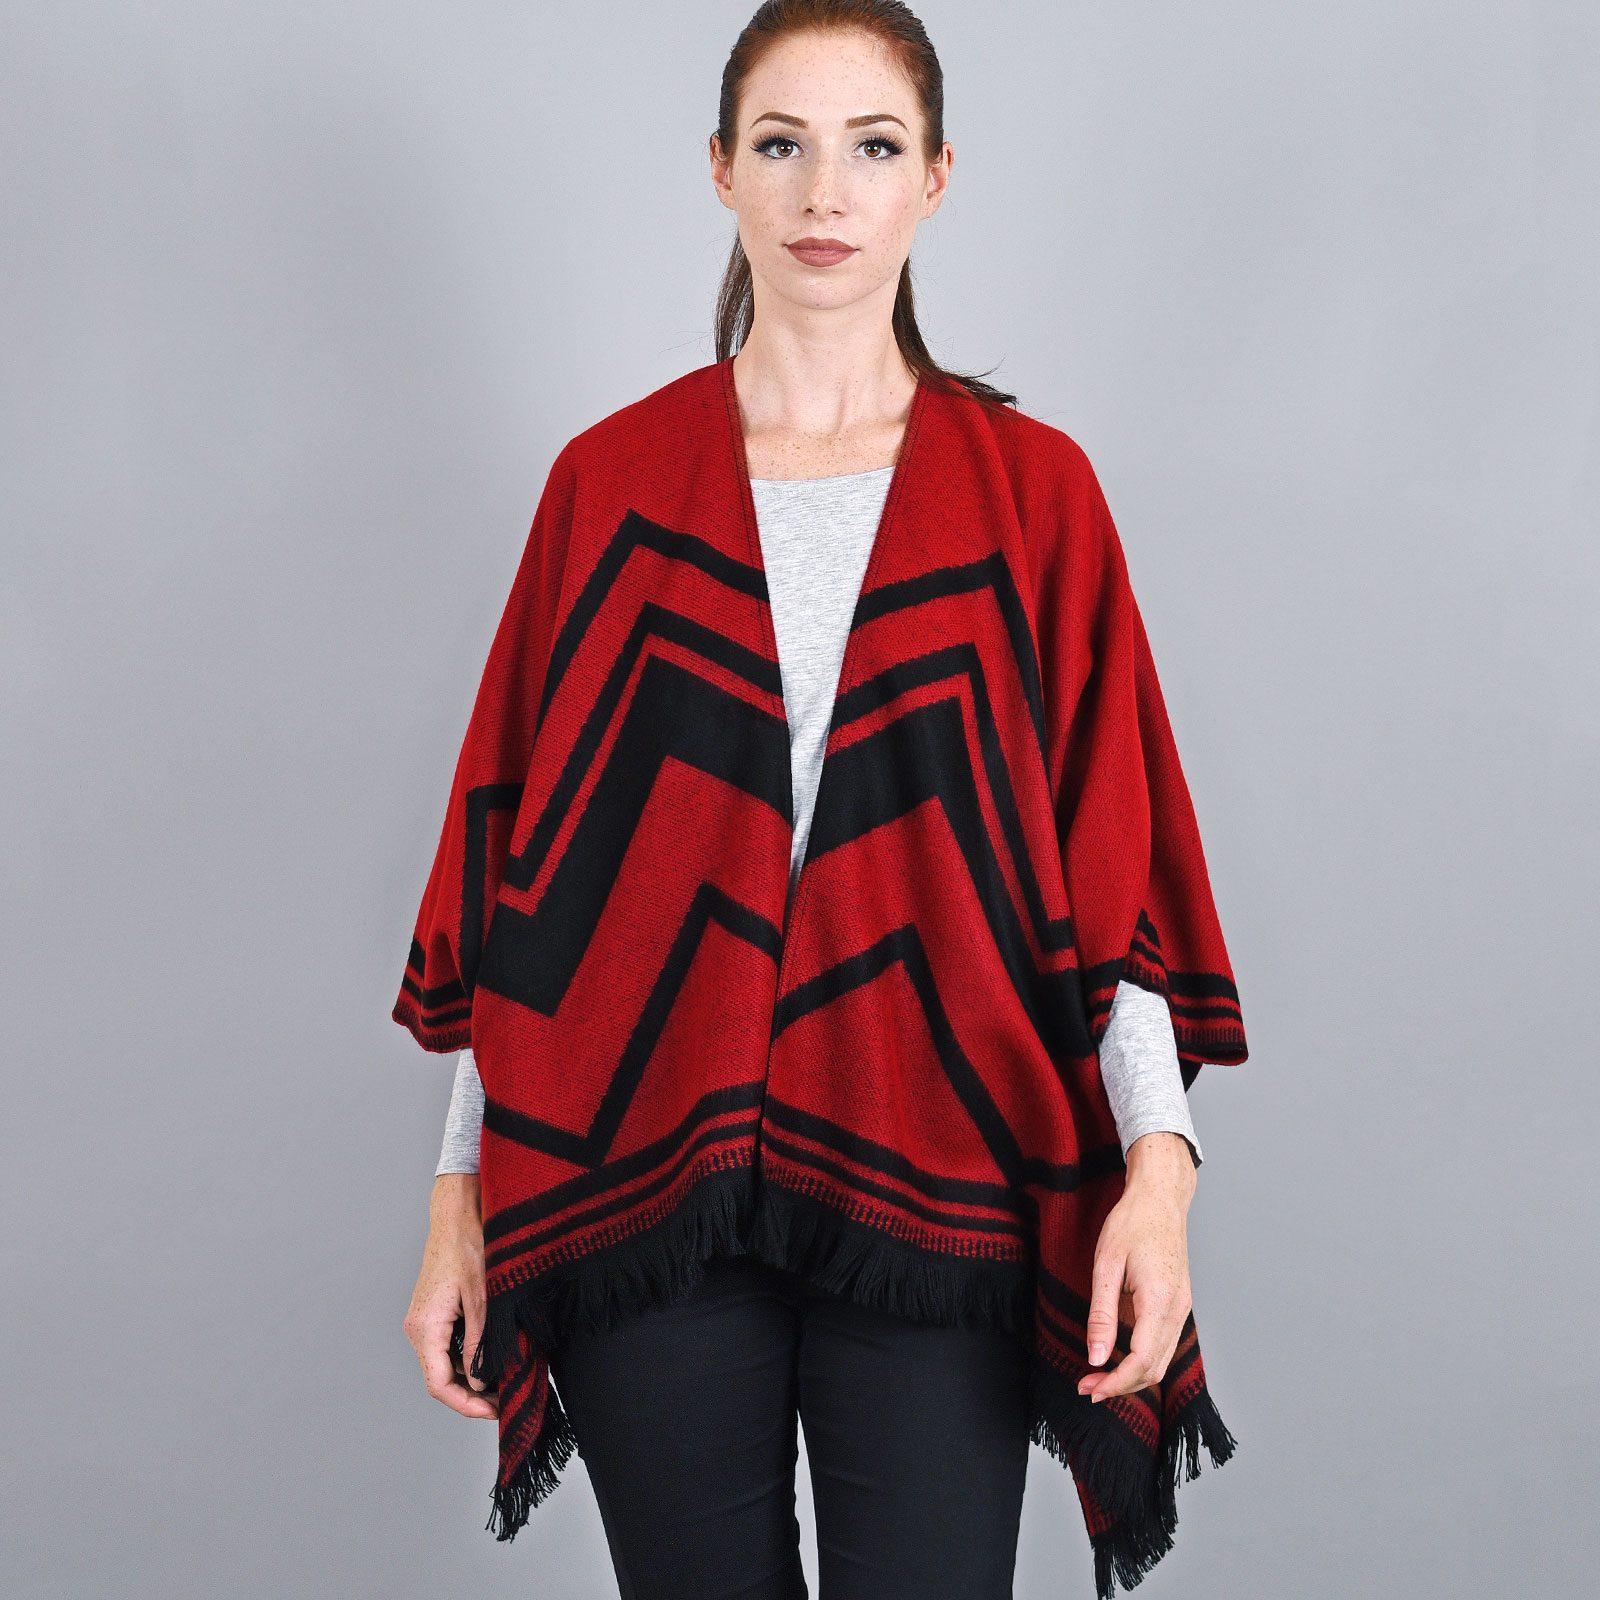 http://lookbook.allee-du-foulard.fr/wp-content/uploads/2019/01/AT-04155-VF16-poncho-femme-azteque-rouge-1600x1600.jpg